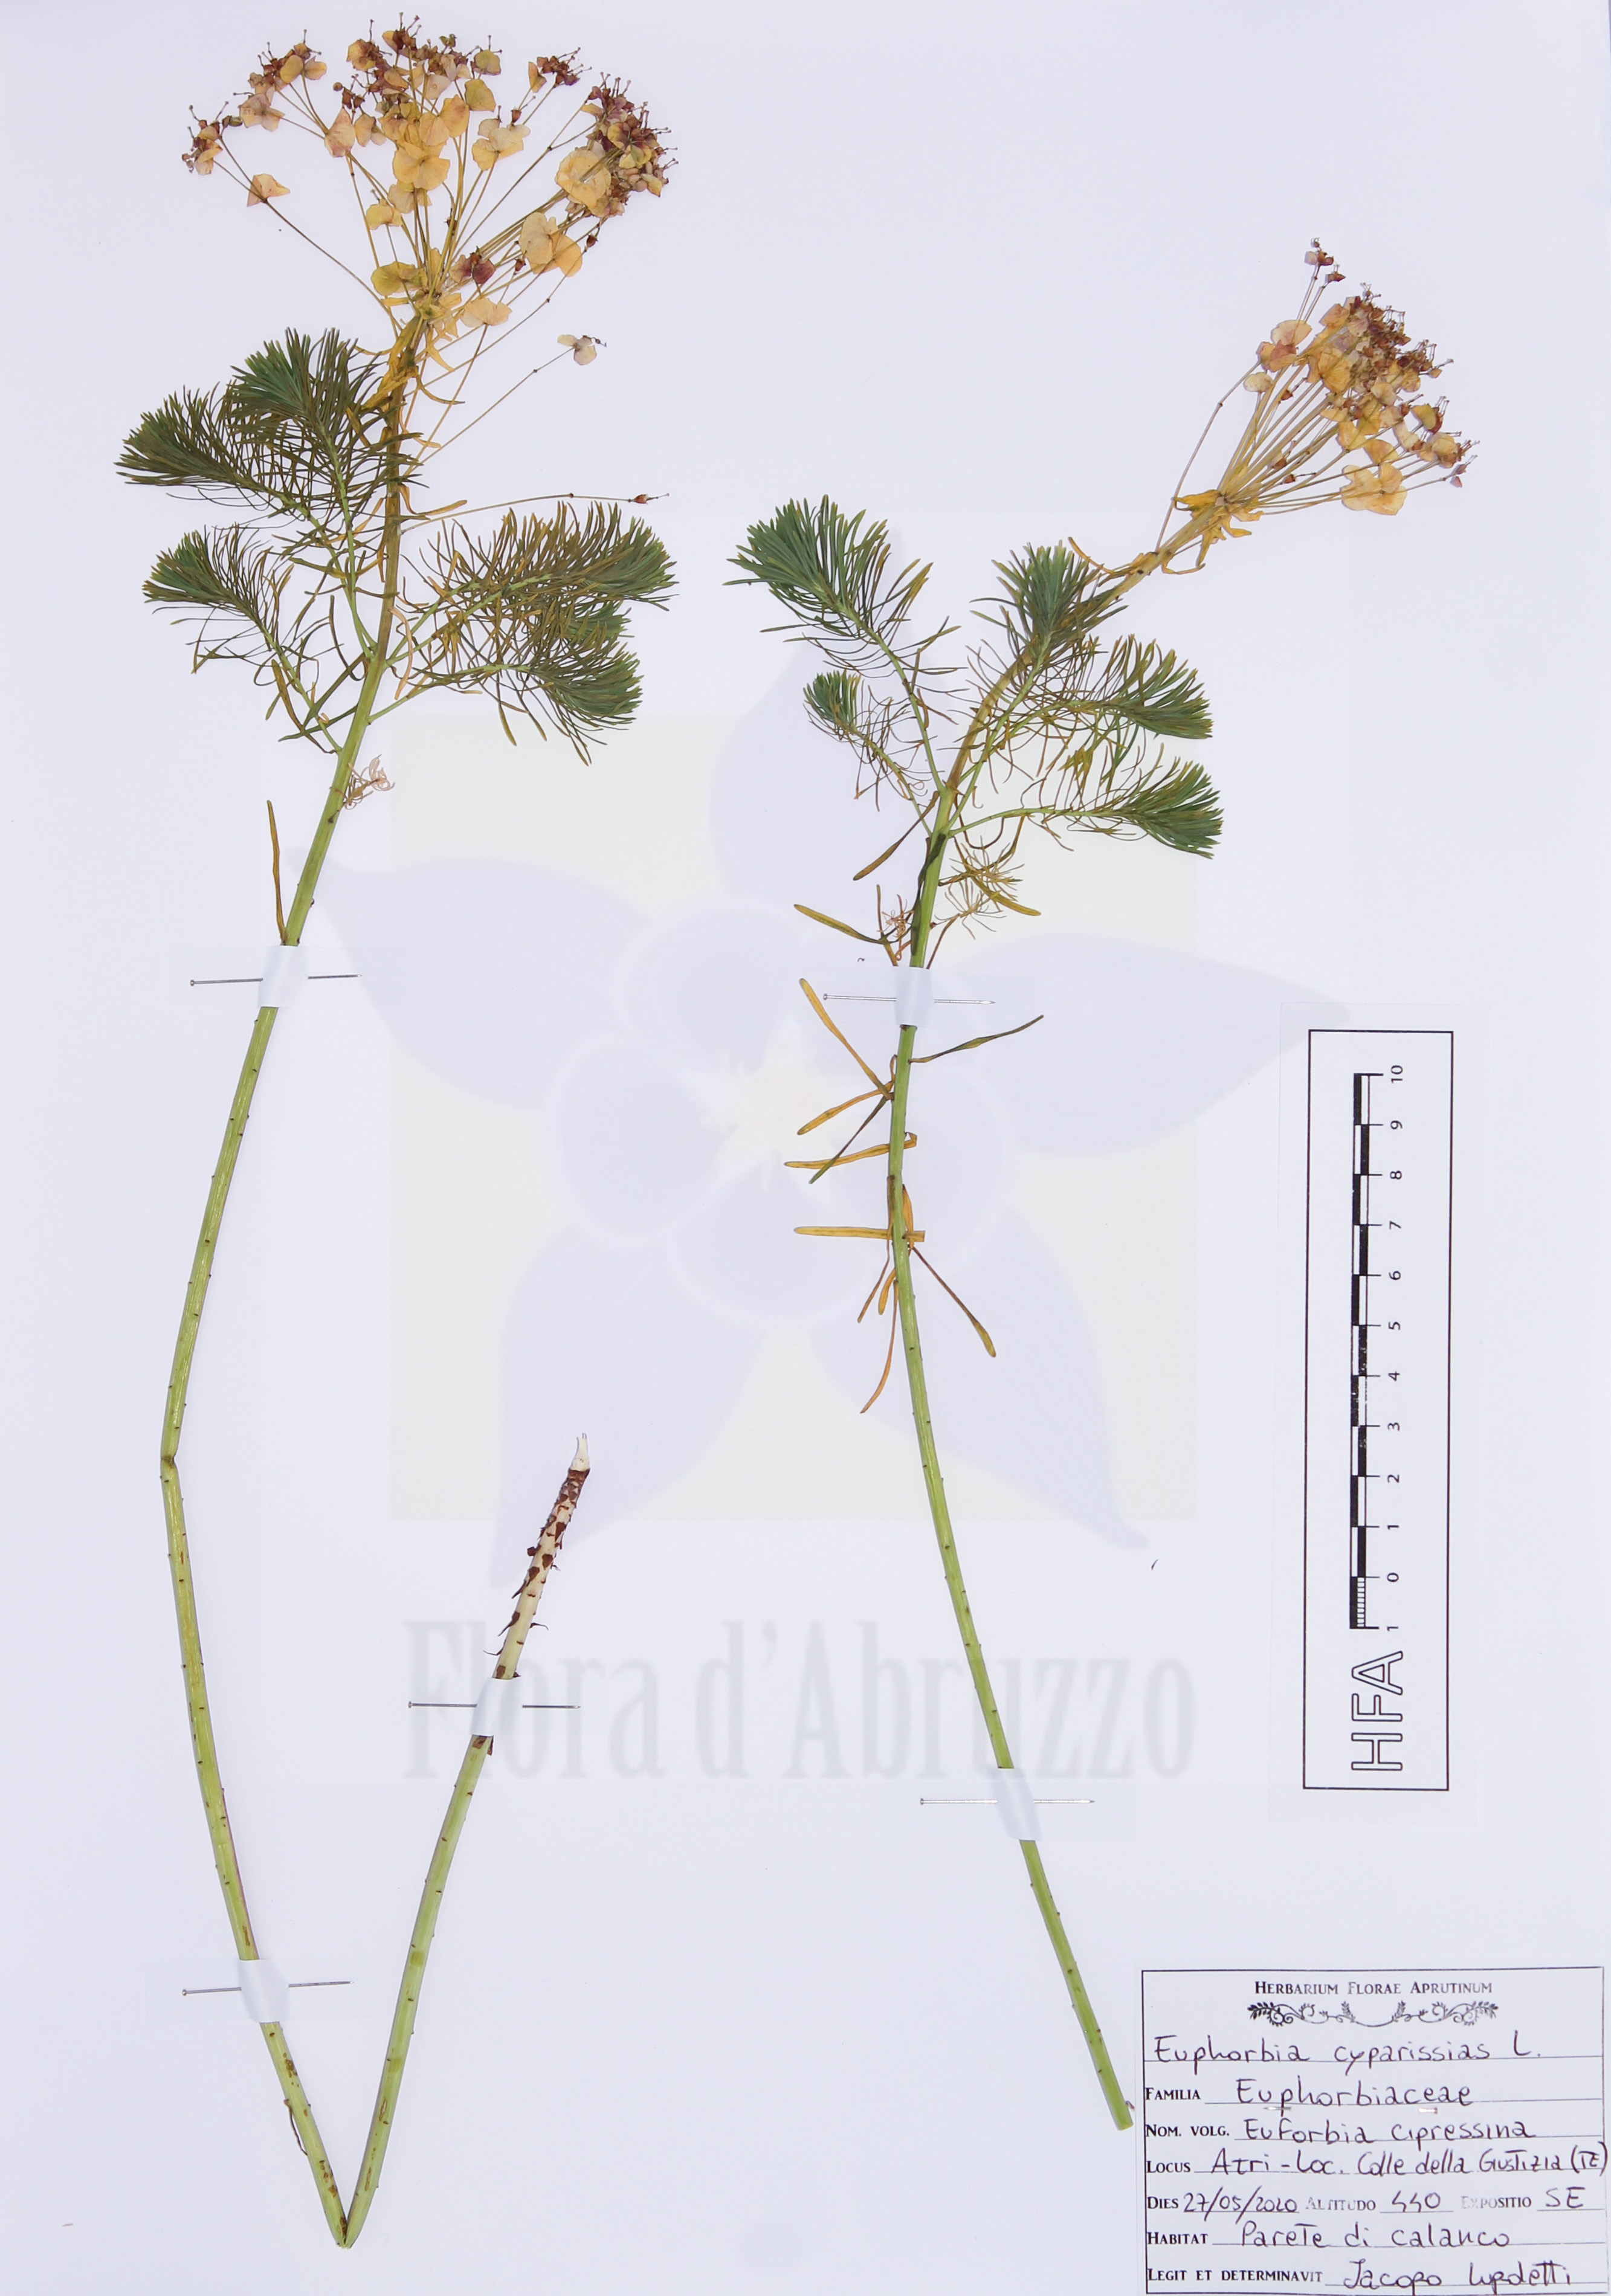 Euphorbia cyparissiasL.